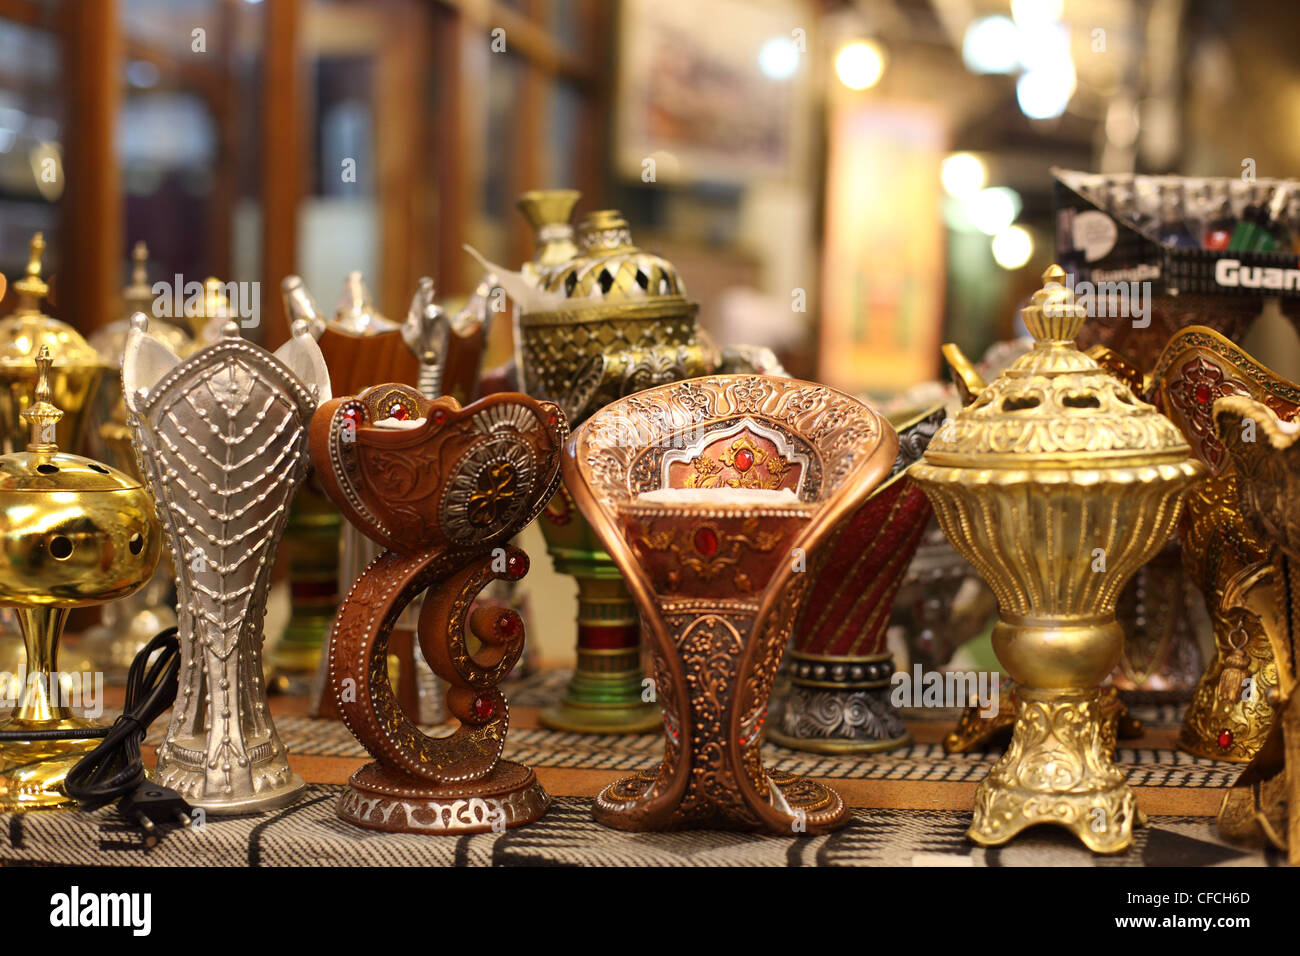 Quemador de incienso tradicional árabe en Doha, Qatar Imagen De Stock